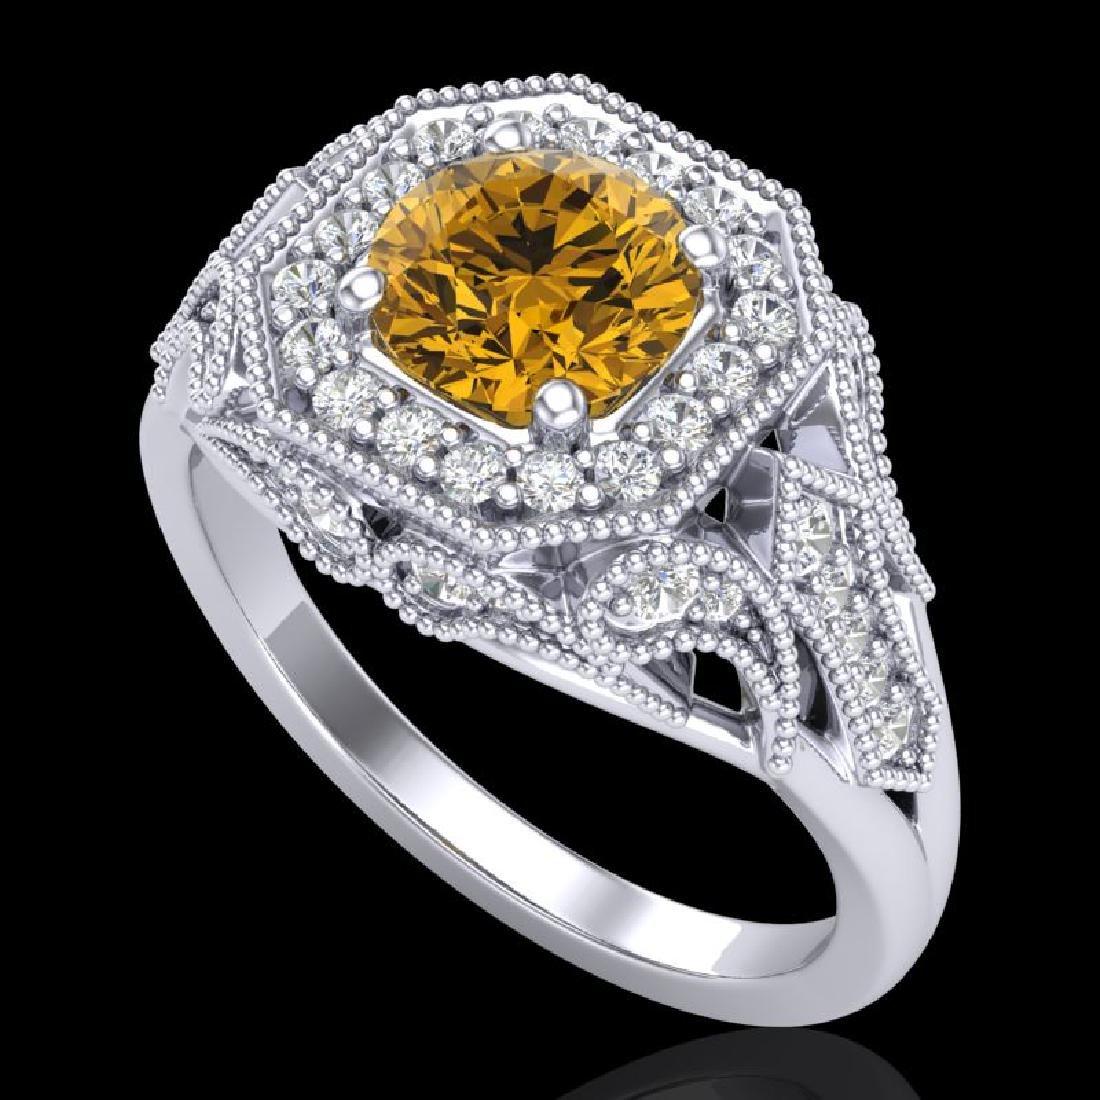 1.75 CTW Intense Fancy Yellow Diamond Engagement Art